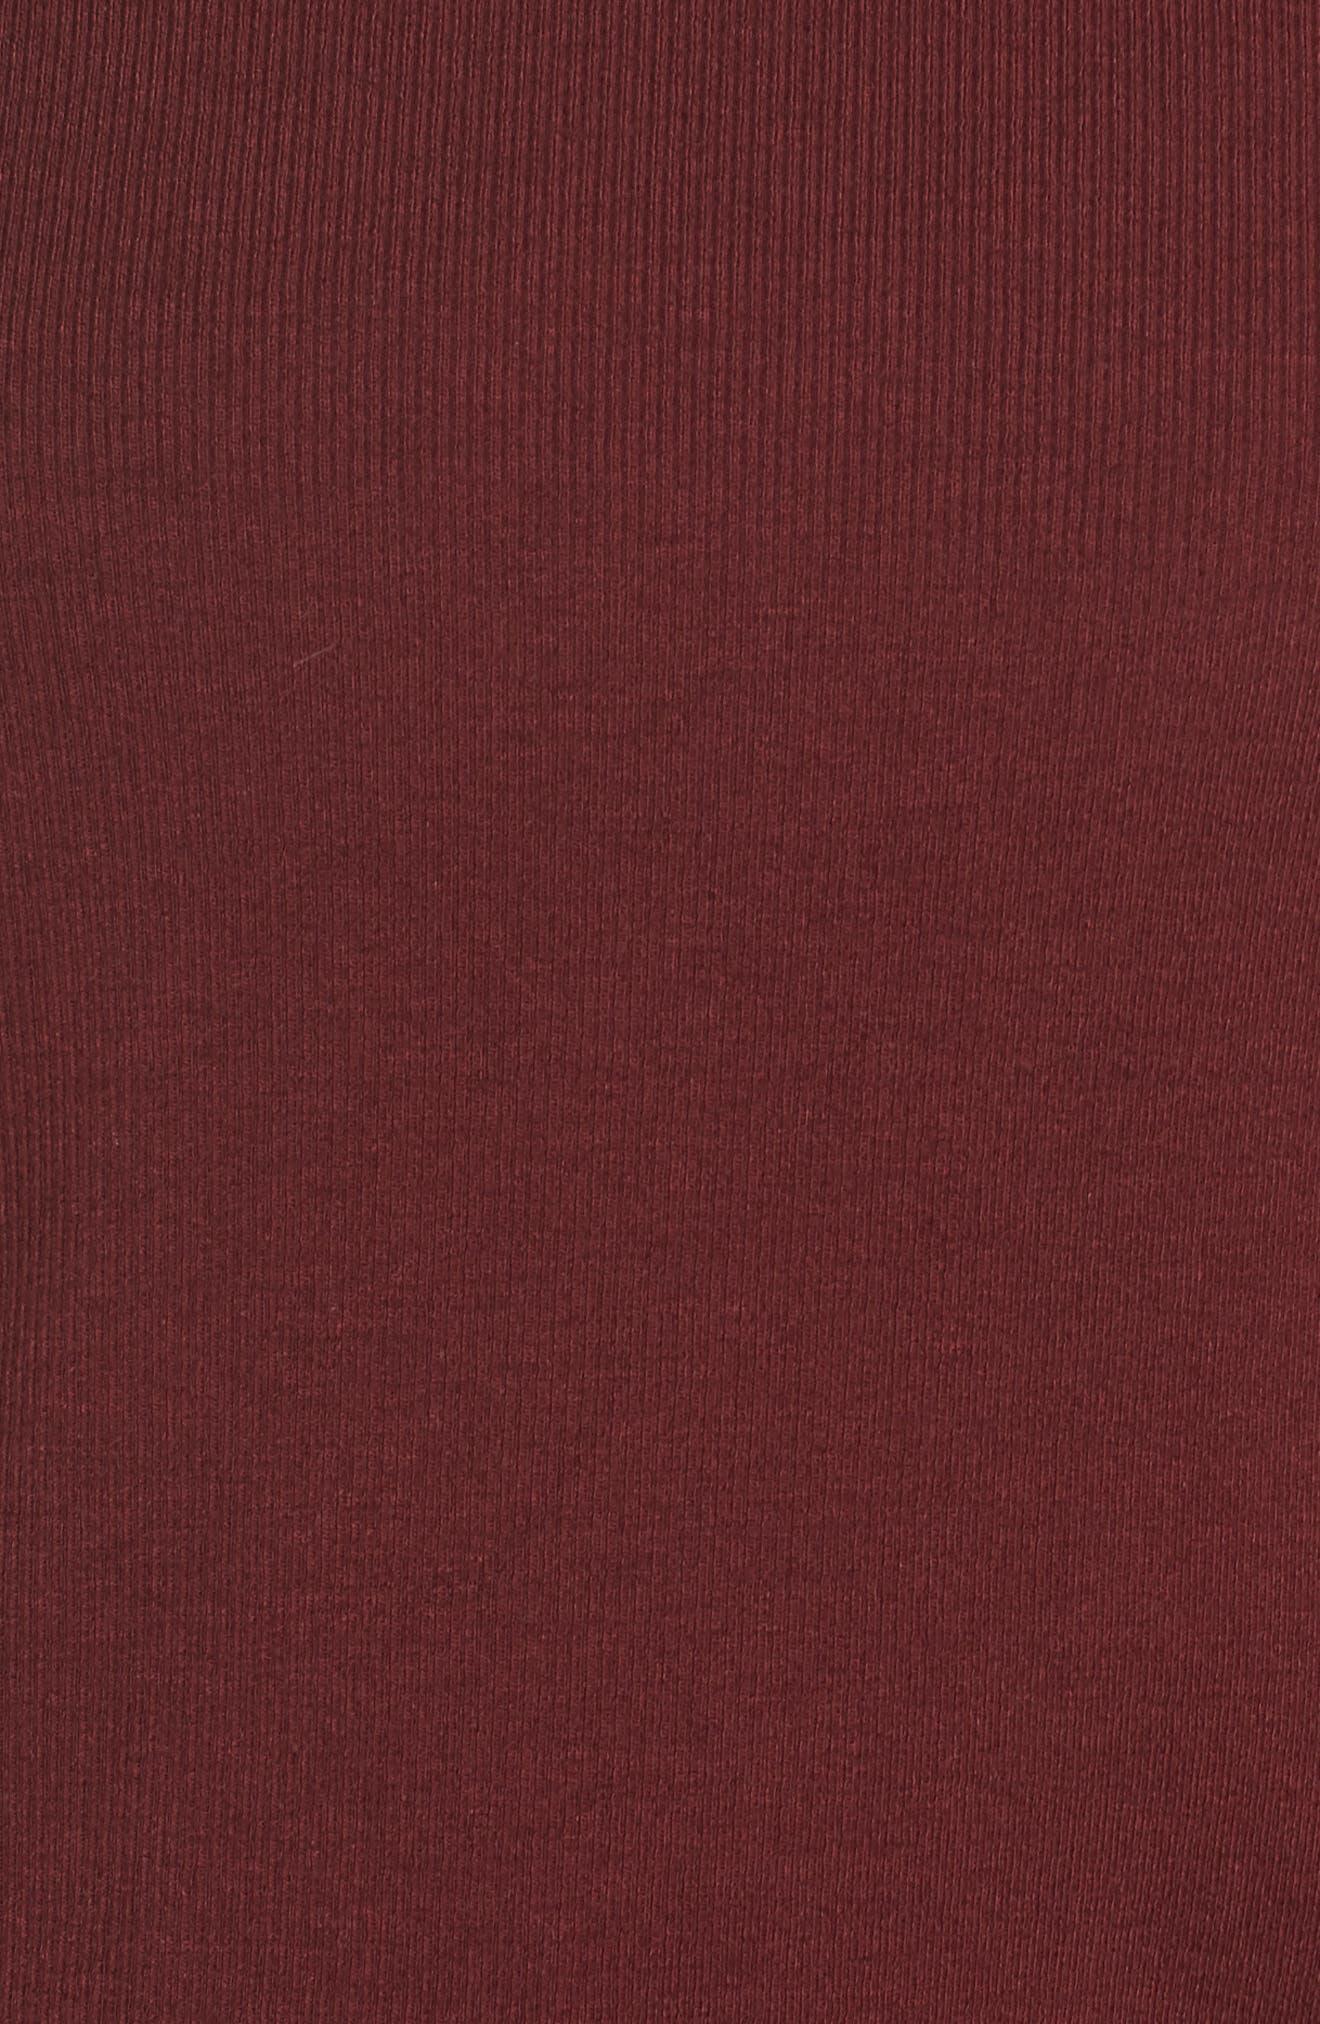 Defender Long-Sleeve Tee,                             Alternate thumbnail 4, color,                             Maroon/ Maple